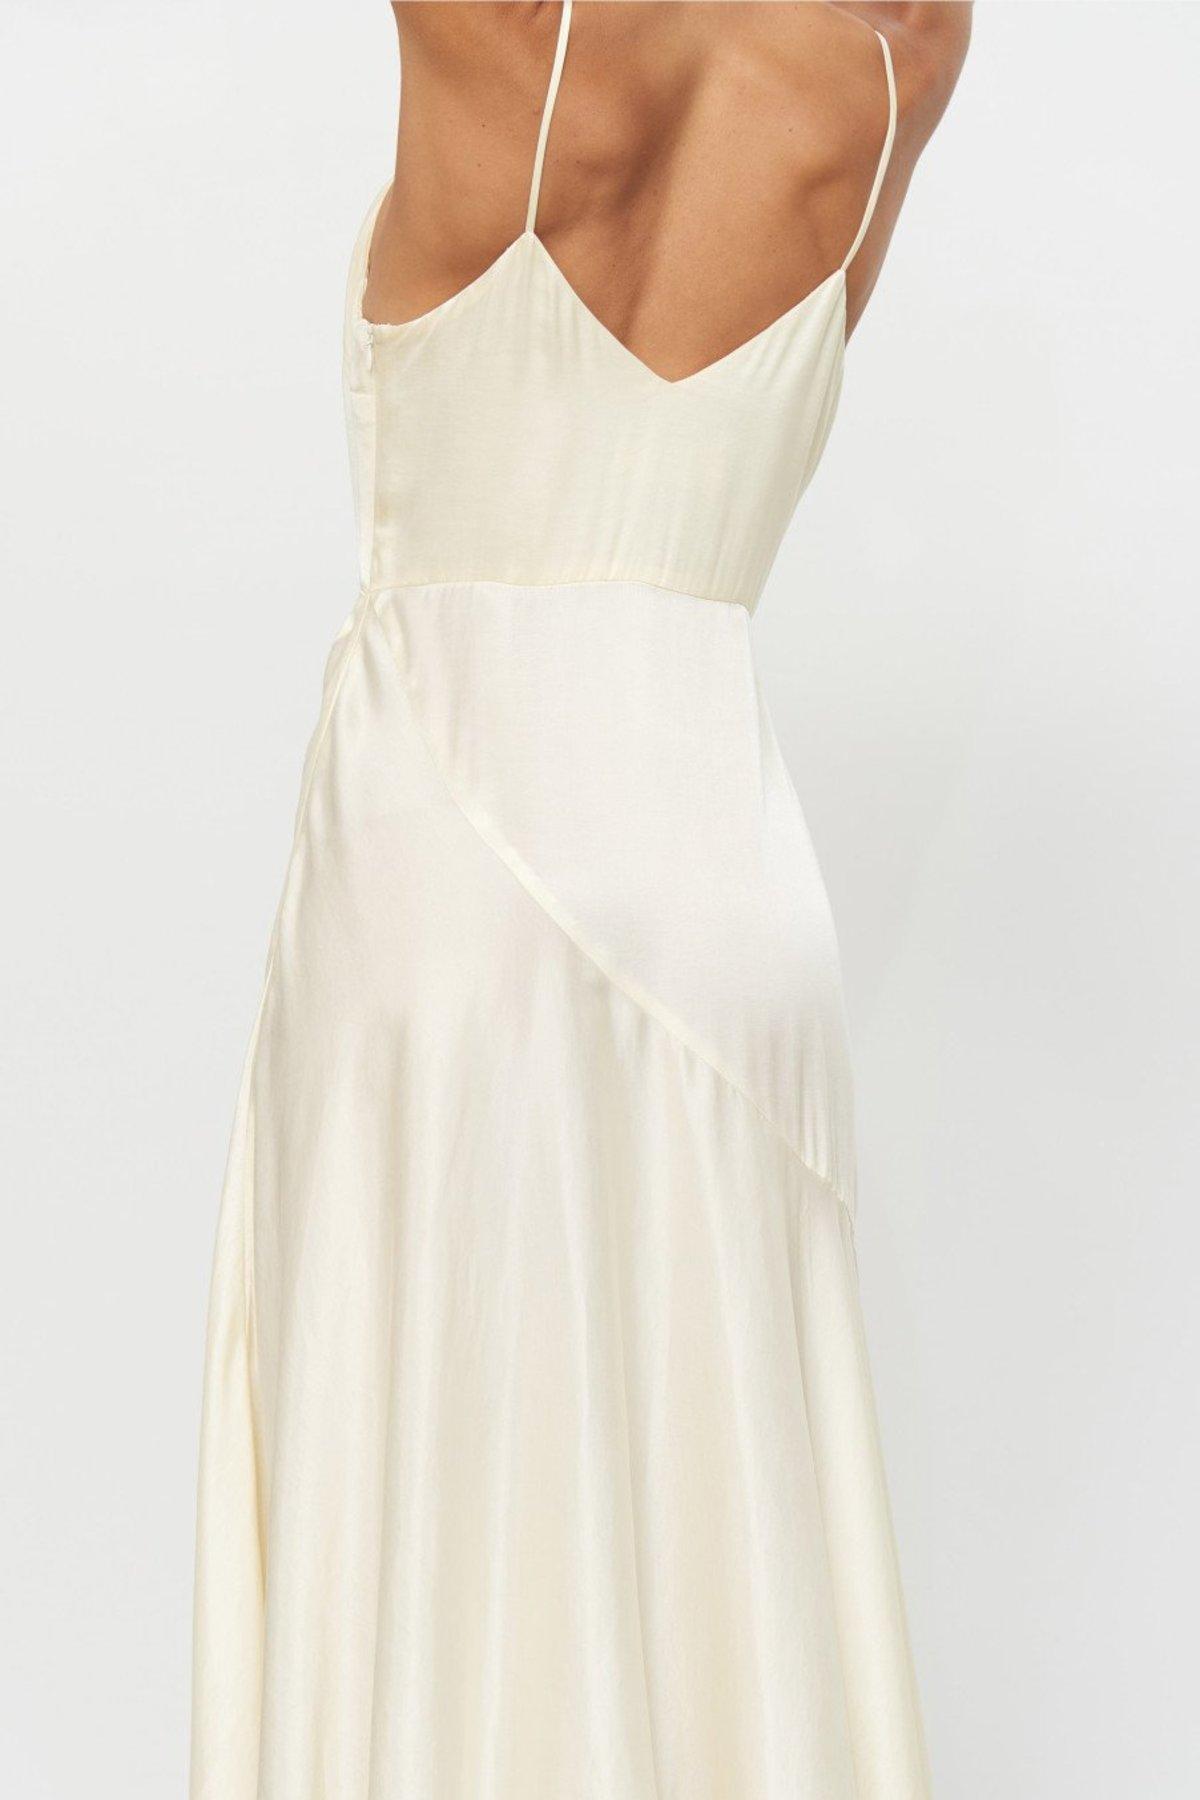 09bfe81f9452 Mara Hoffman Nina Dress - Cream   Garmentory